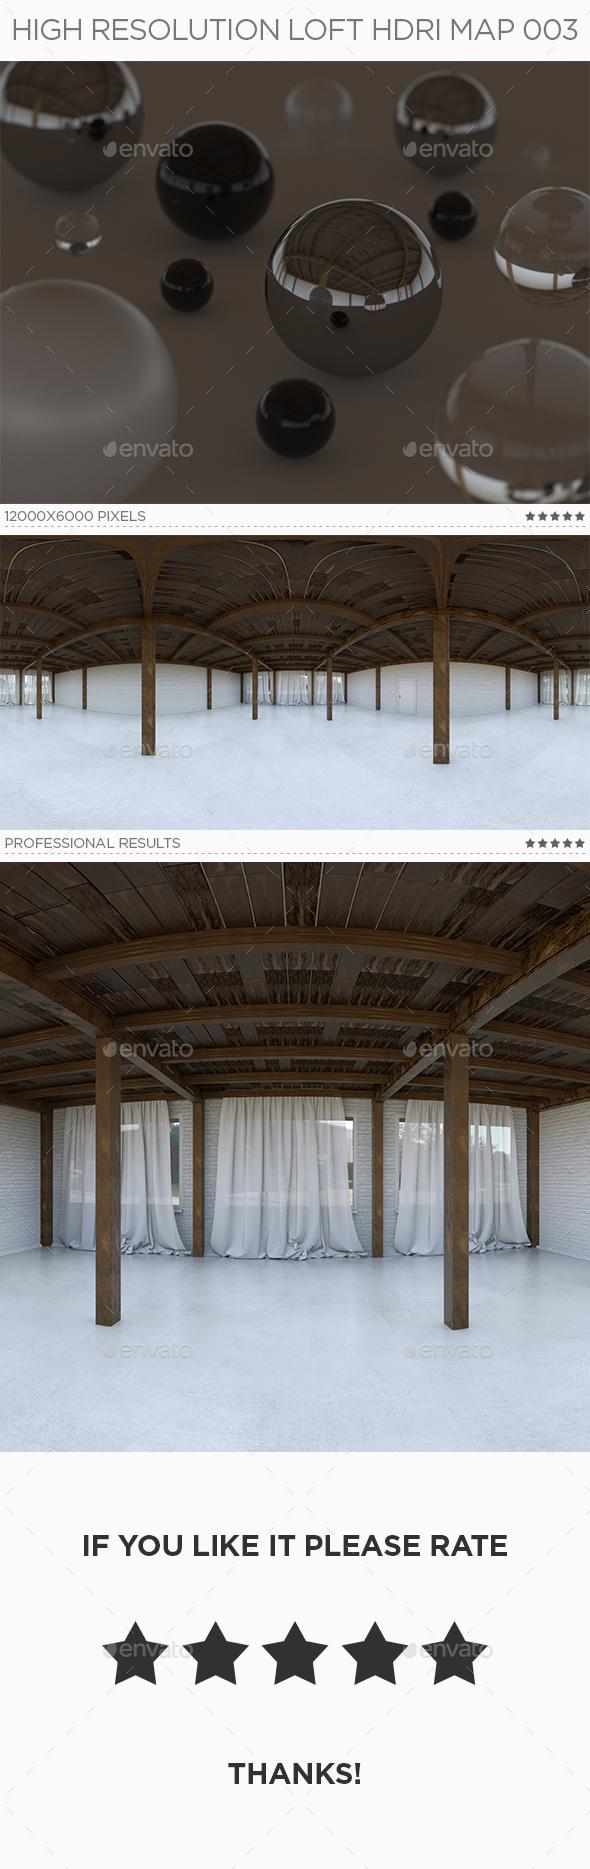 High Resolution Loft HDRi Map 003 - 3DOcean Item for Sale